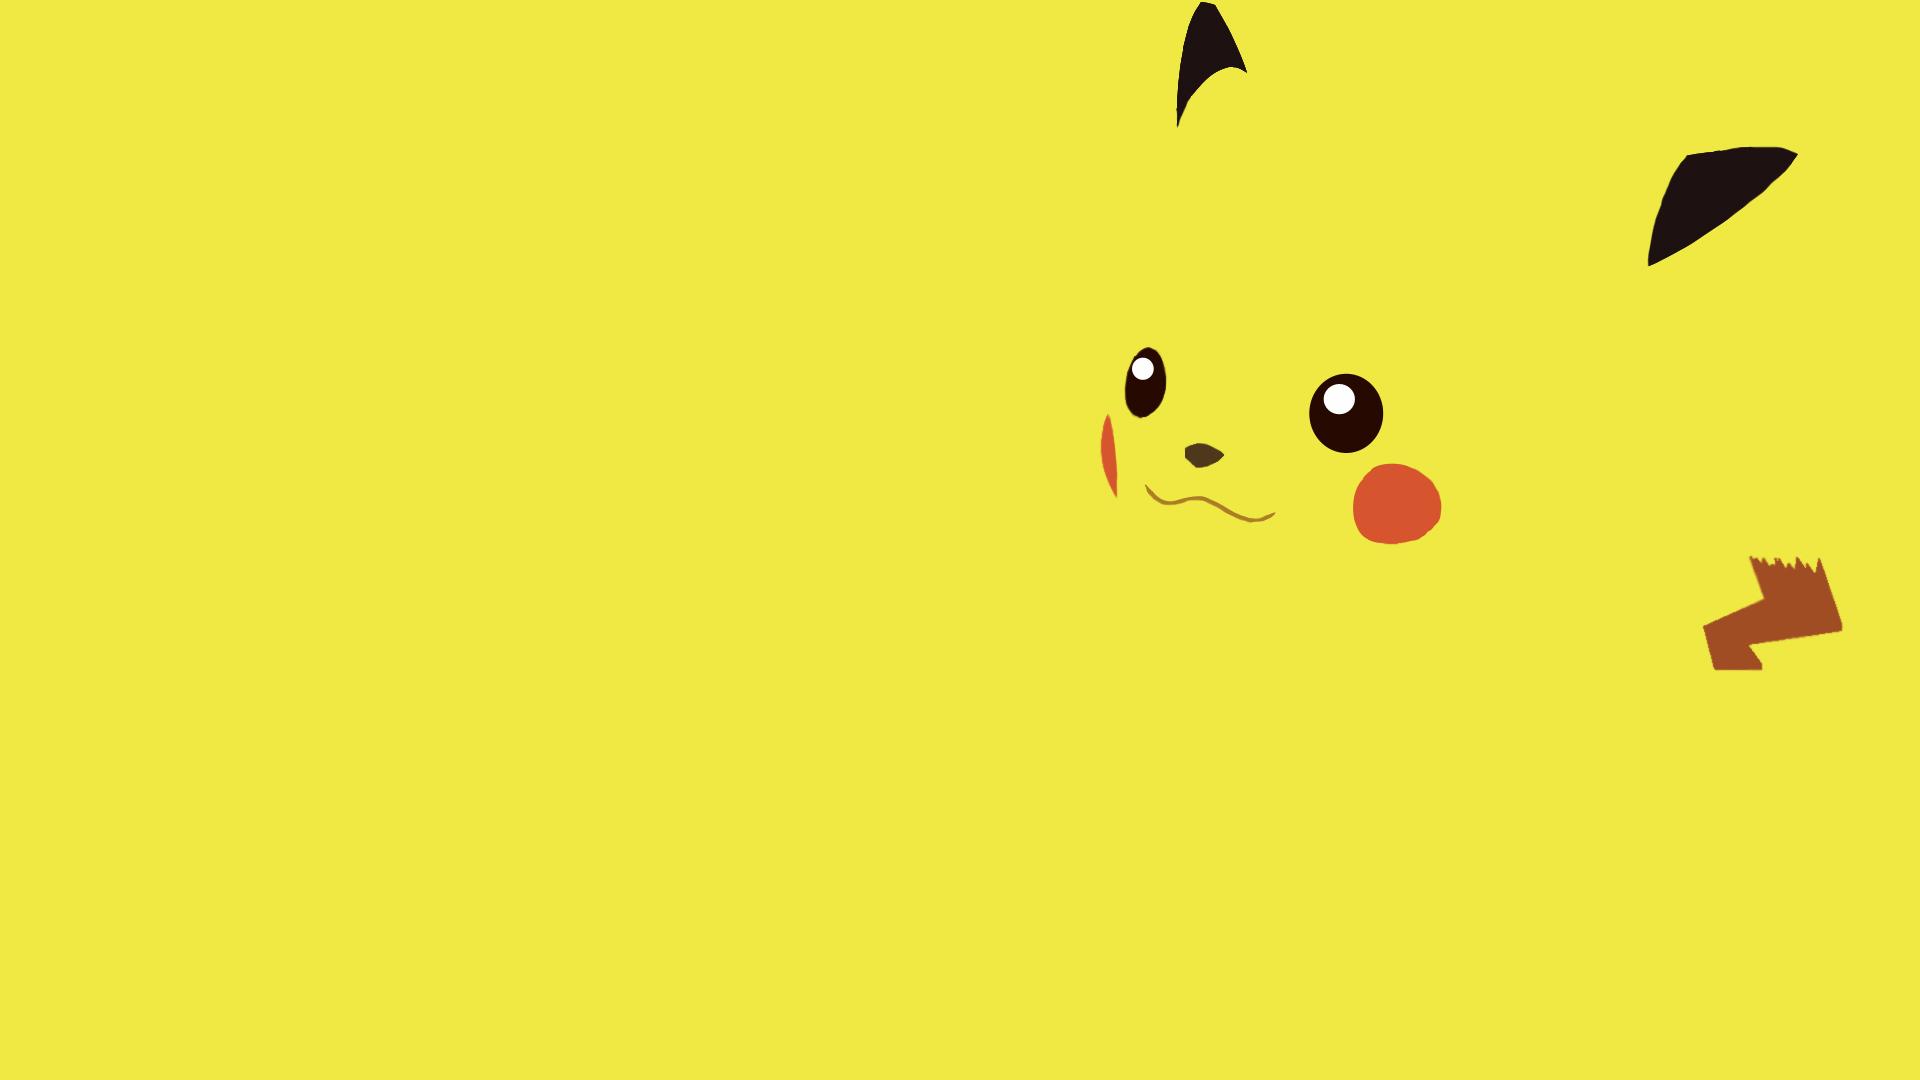 Cute-Pokemon-Full-HD-Pics-1920×1080-wallpaper-wp3604494